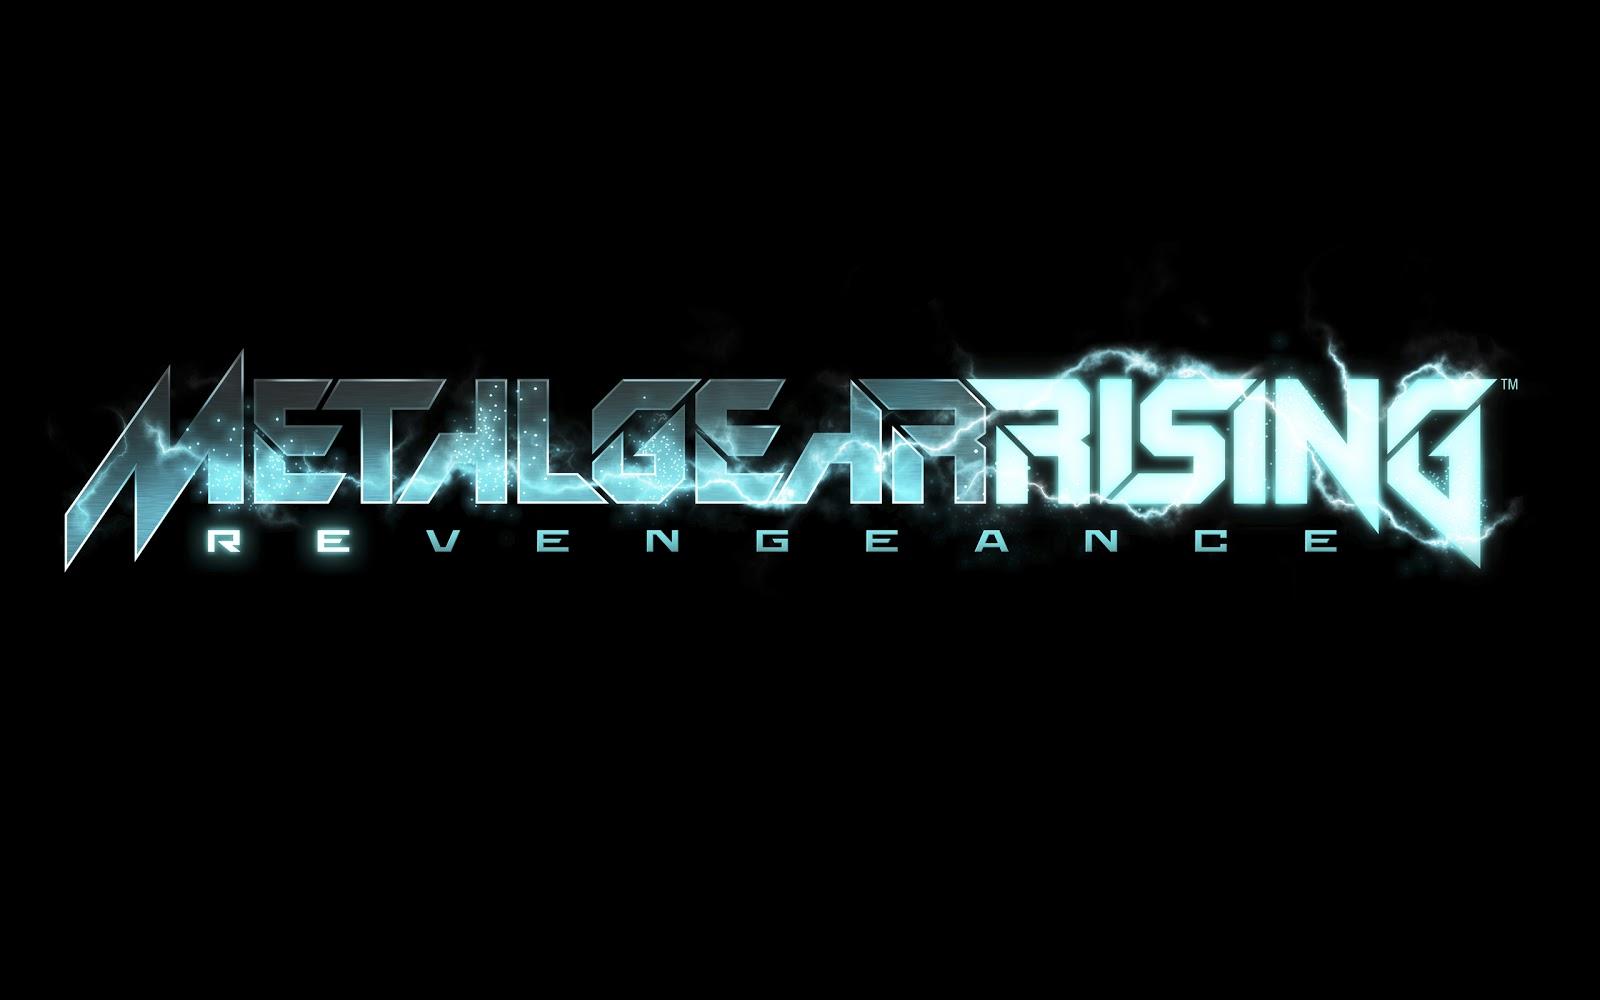 Metal Gear Rising: Revengeance [Analisis Propio]